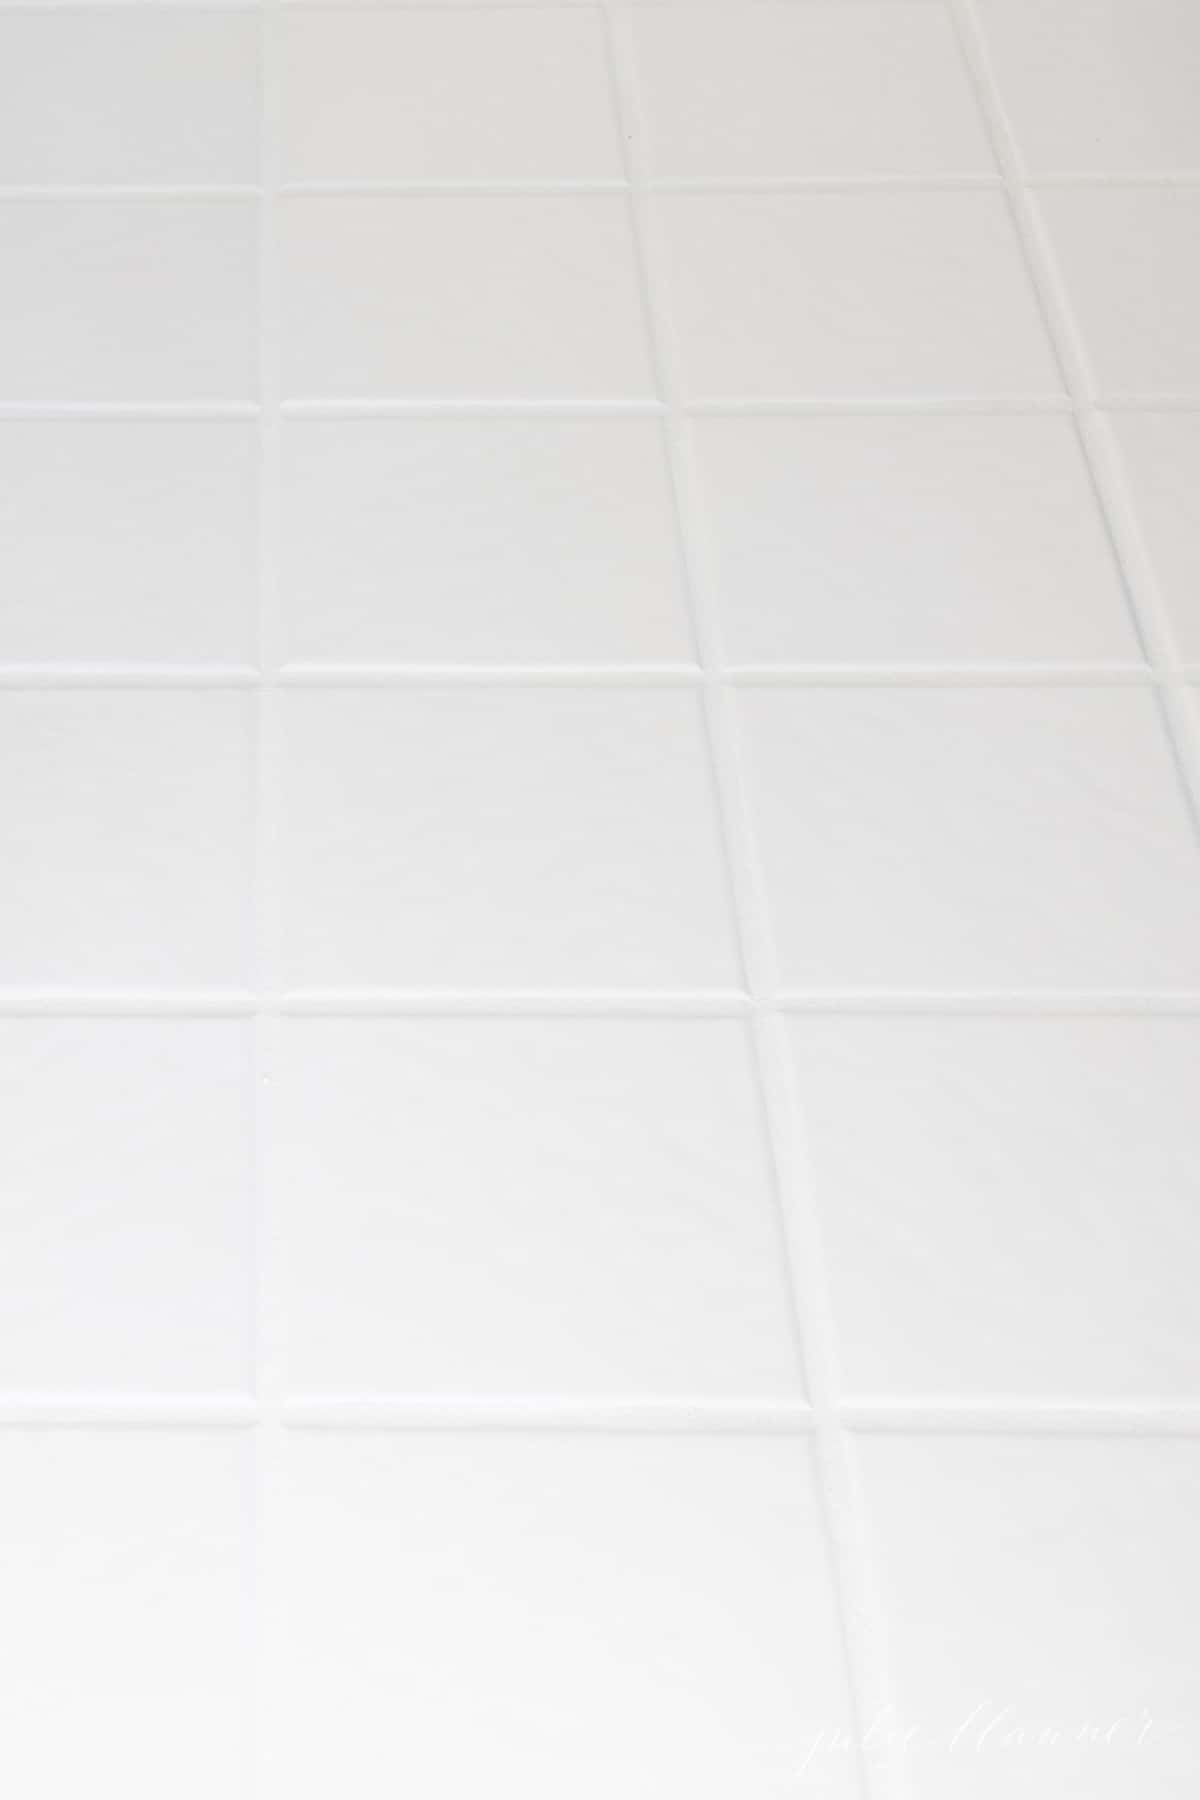 tile after using tile grout paint